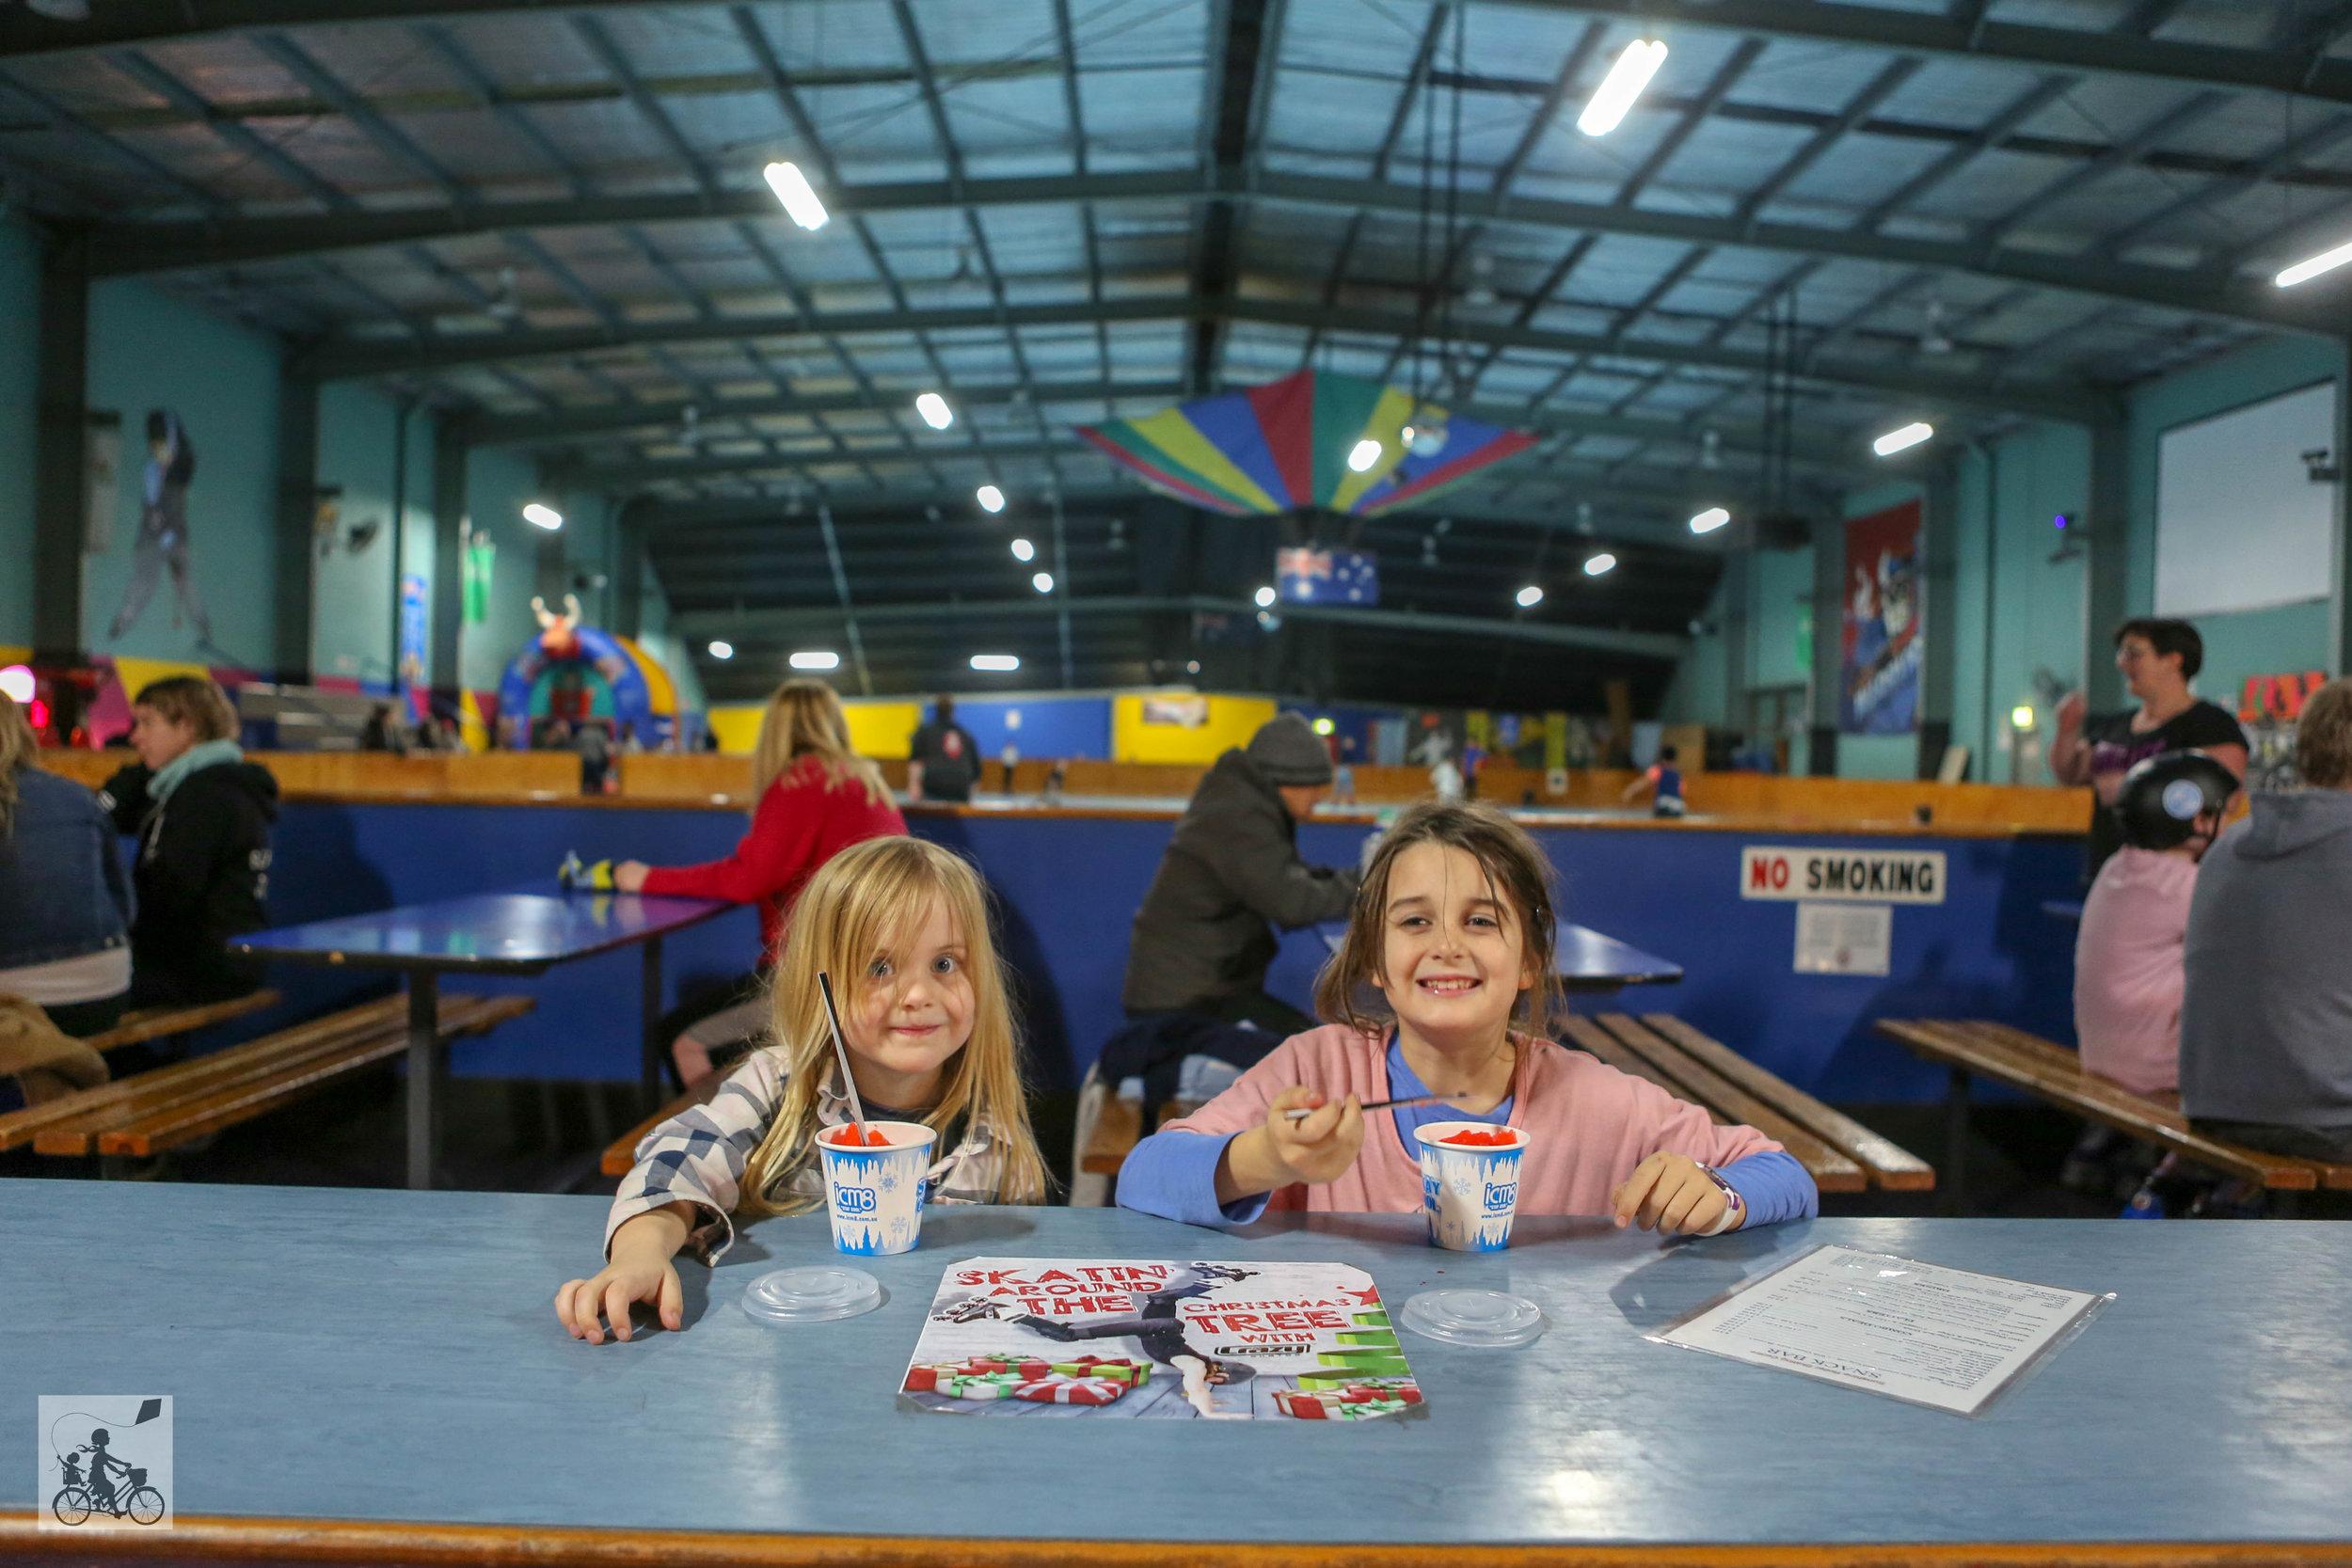 Sunshine Skate Centre - Mamma Knows West (7 of 13).jpg